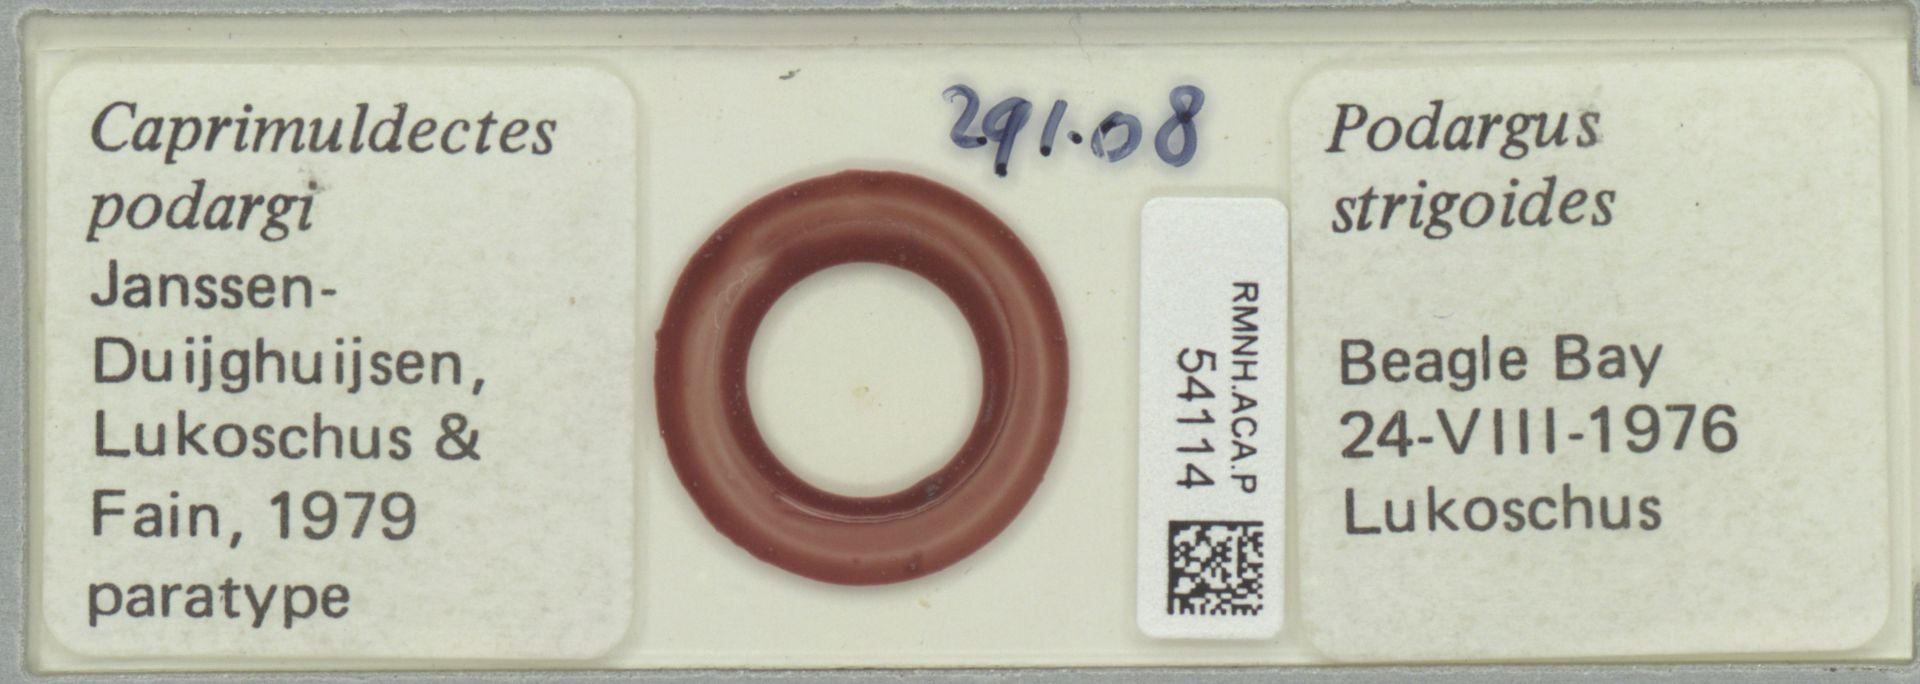 RMNH.ACA.P.54114 | Caprimuldectes podargi Janssen Duijghuijsen, Lukoschus & Fain, 1979